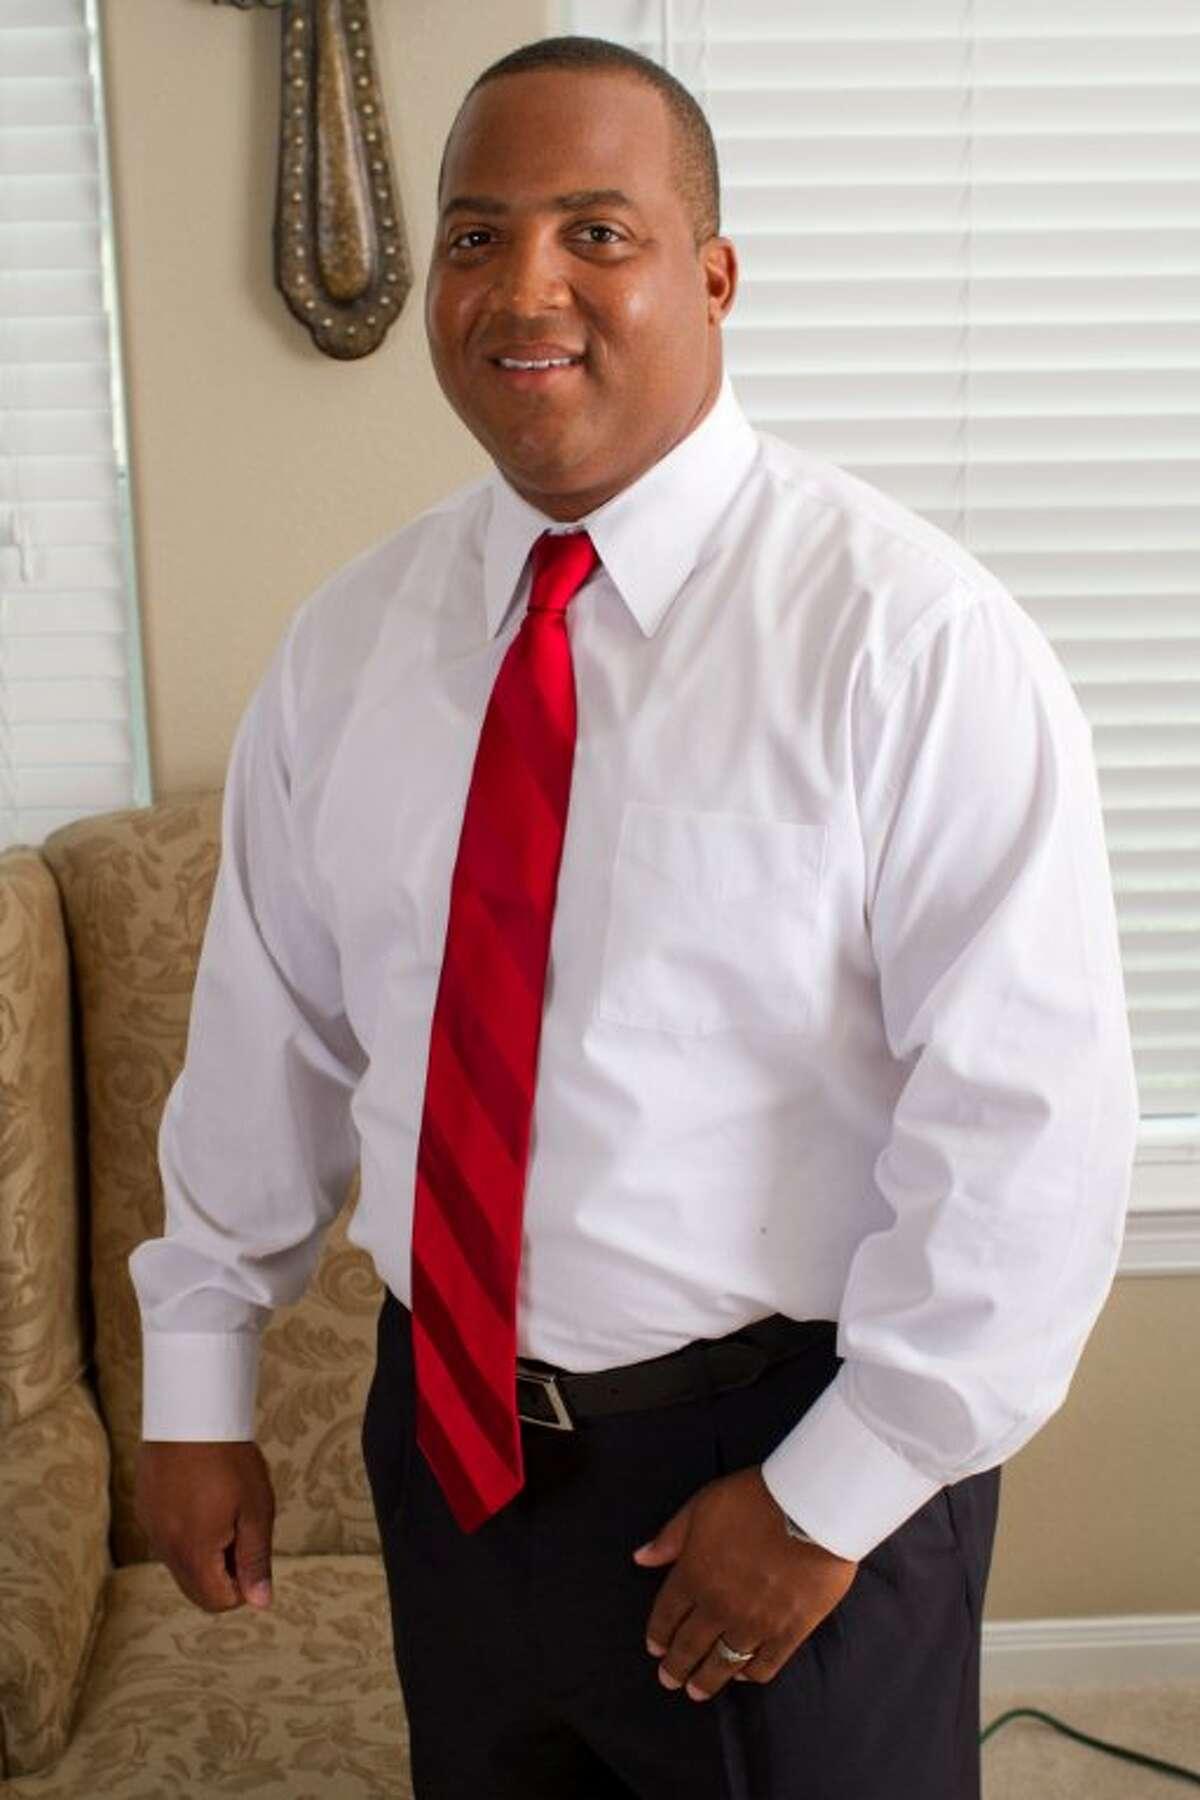 Zerick Guinn, Democratic candidate for Harris County Precinct 2 Constable.